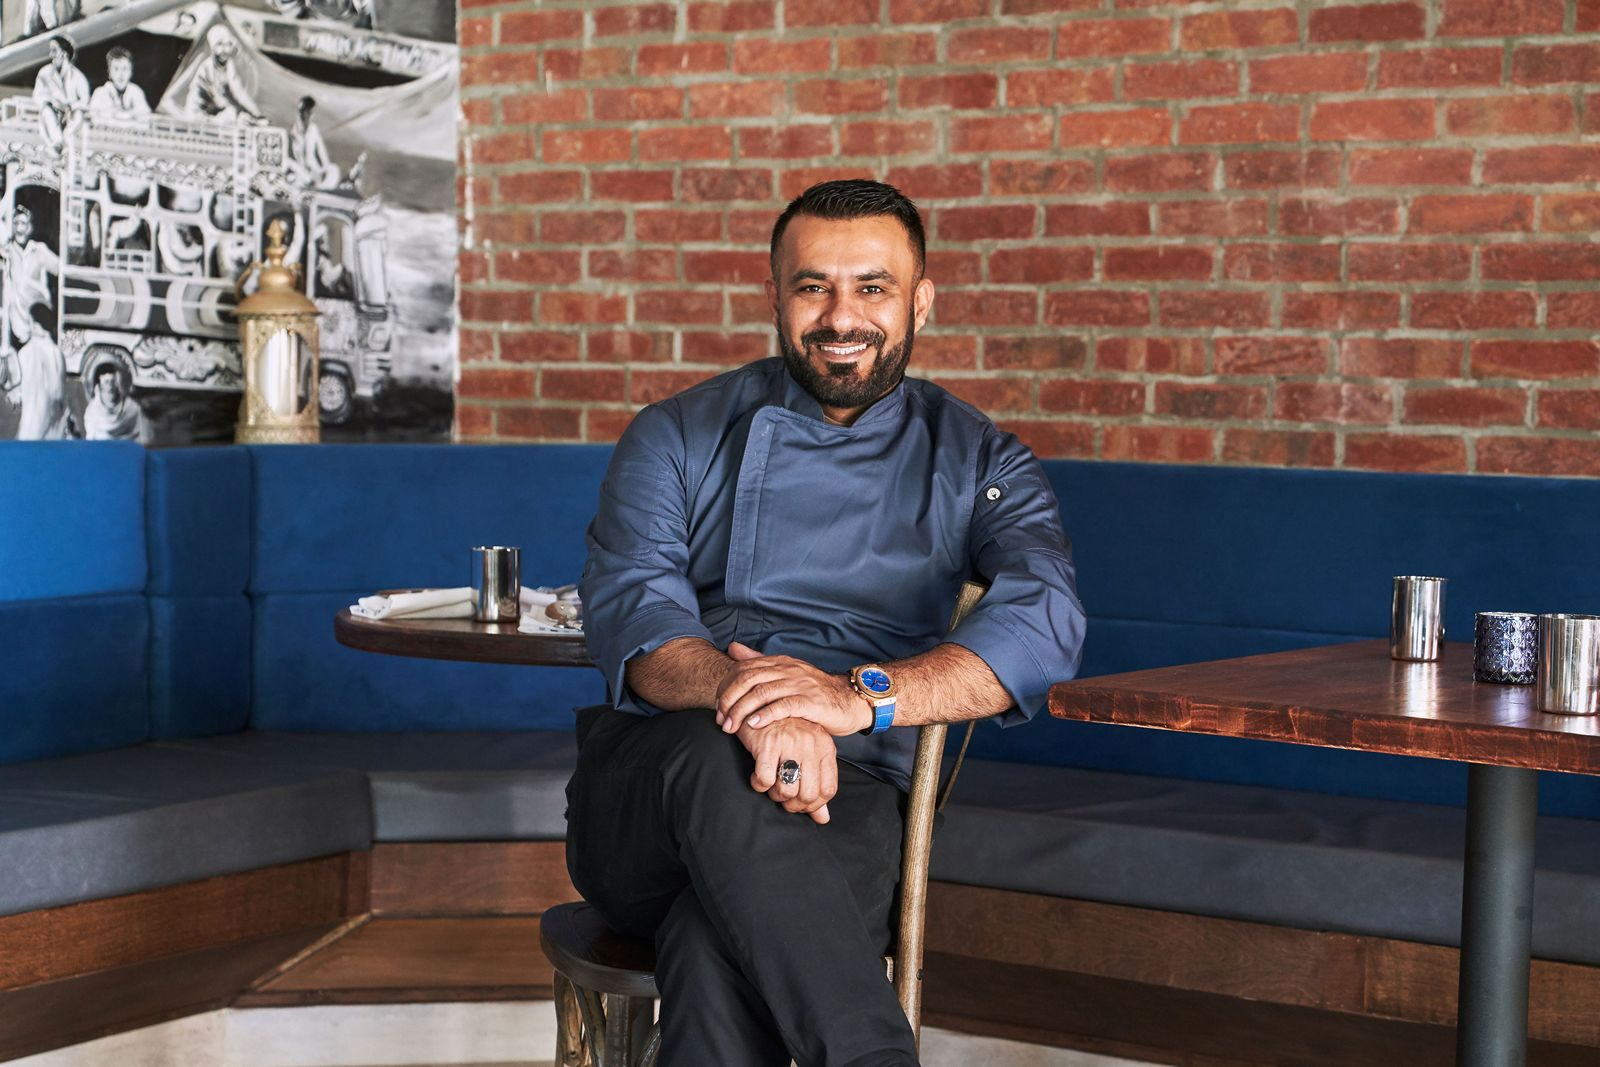 Award-Winning Chef Opens Khan Saab Desi Craft Kitchen in Downtown Fullerton